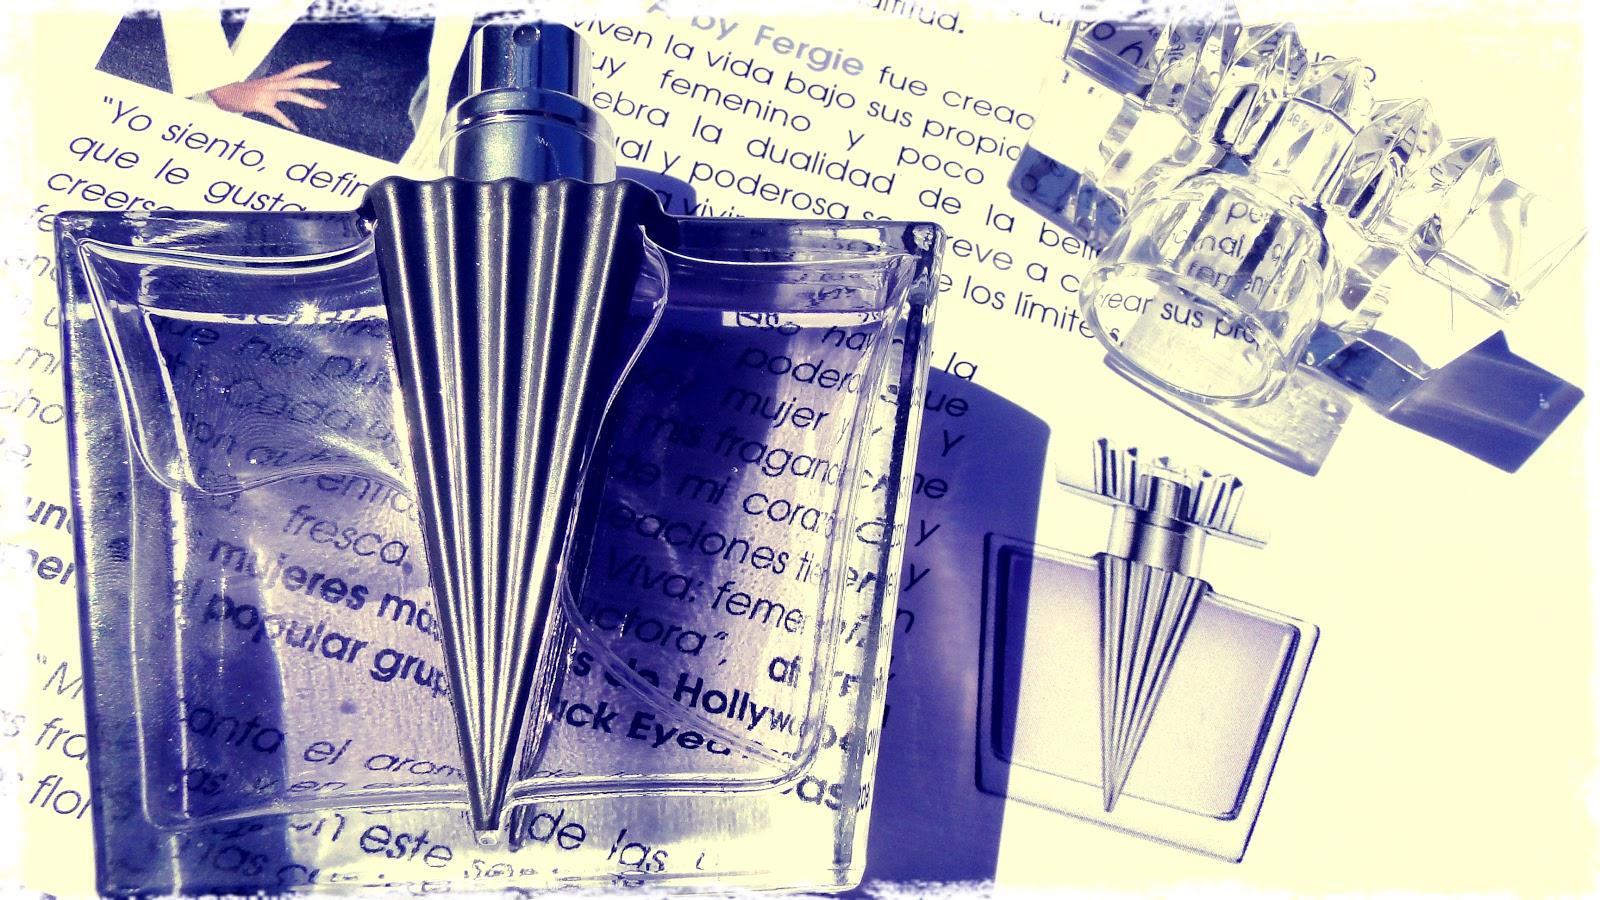 http://4.bp.blogspot.com/-lyEN4SQy3CI/UIqLRFVXJ4I/AAAAAAAAKsU/R-oeUsOPhCQ/s1600/viva+por+fergie.jpg